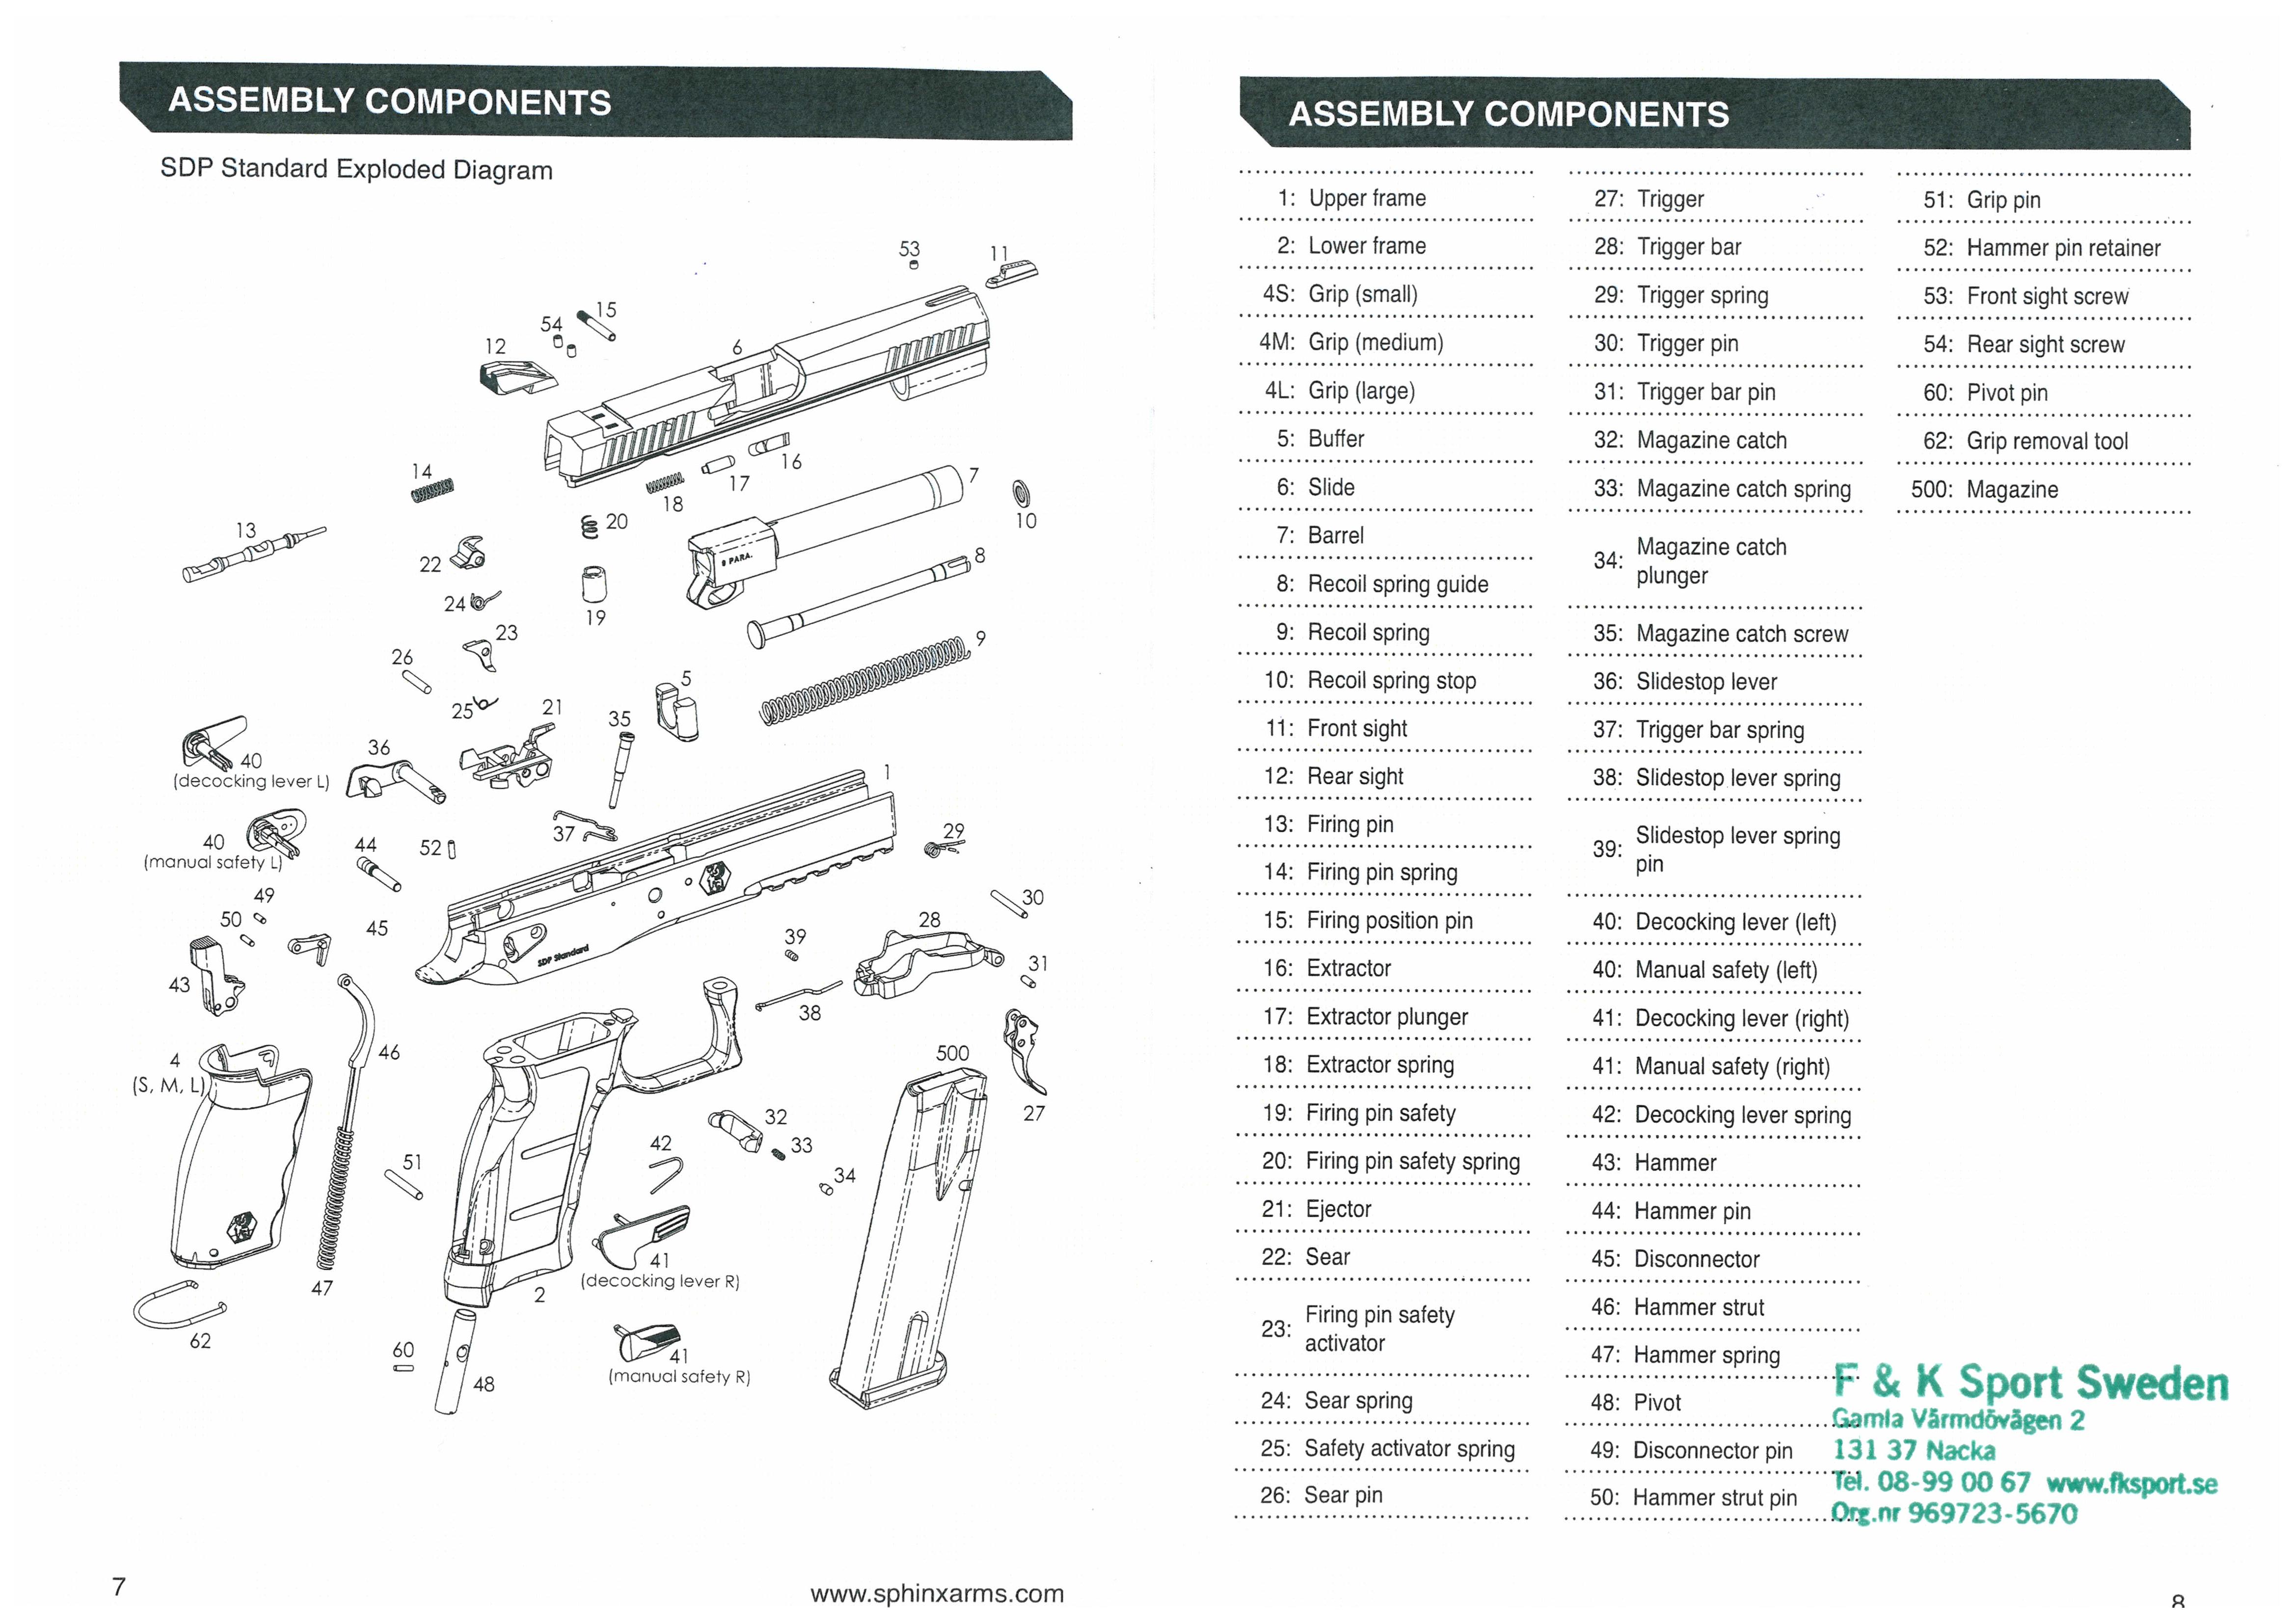 Roni Glock Diagram Schematics Wiring Diagrams Parts F K Sport Sweden Ab Rekylfj U00e4der Sdp Full Size 17 Kit 23